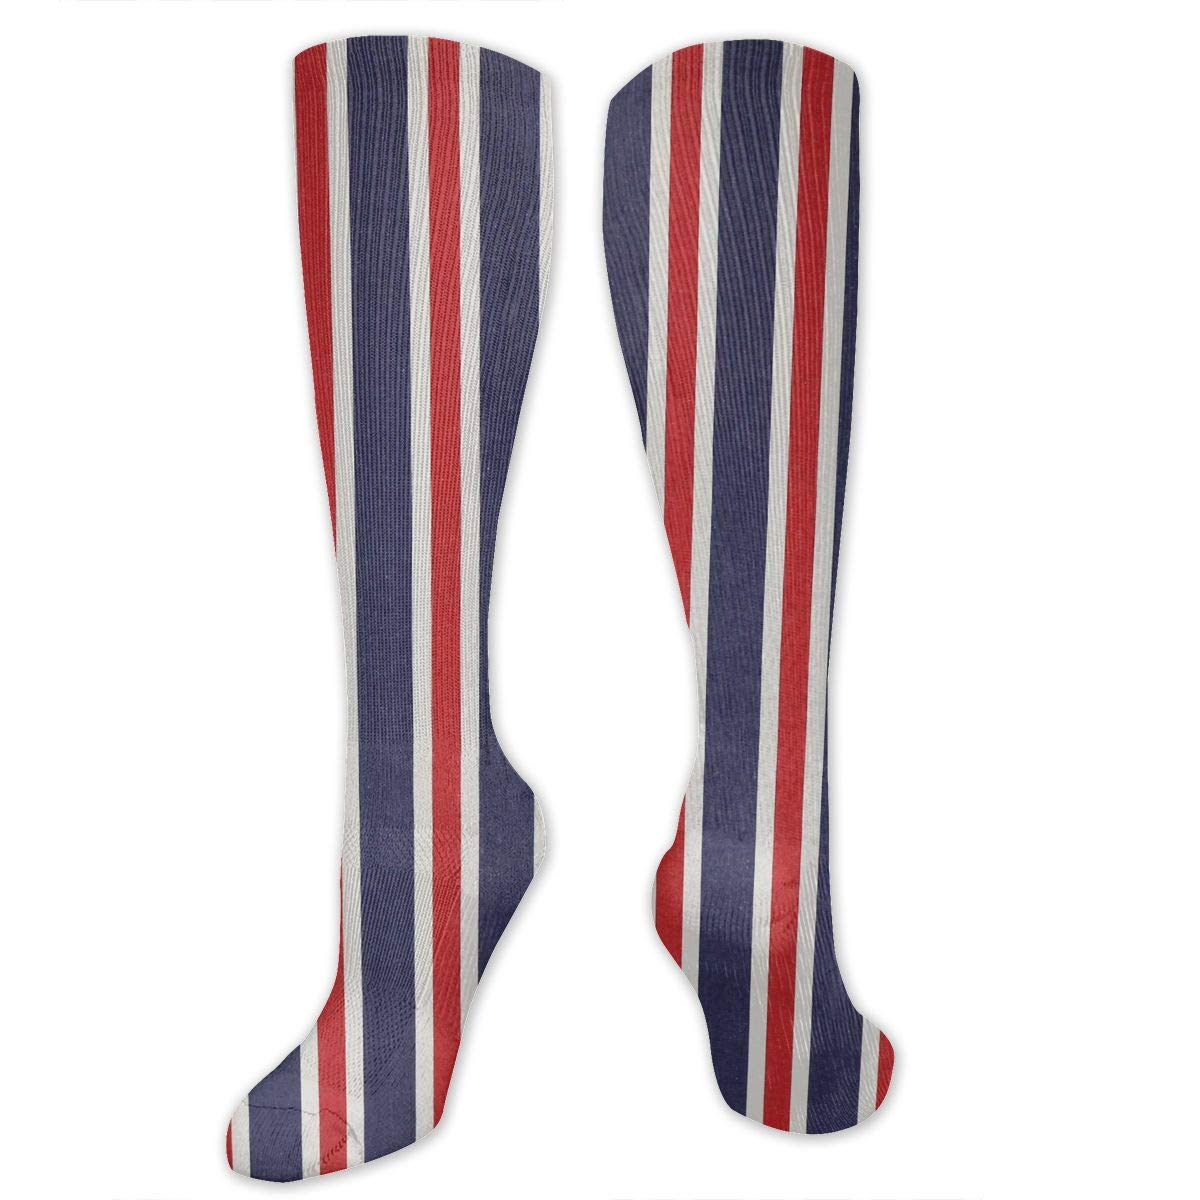 Willbegood99 Red White and Blue Striped Fabrics Mens Fun Dress Socks Colorful Pattened Novelty Mid-Calf Crew Socks Premium Cotton Vibrant Art Socks